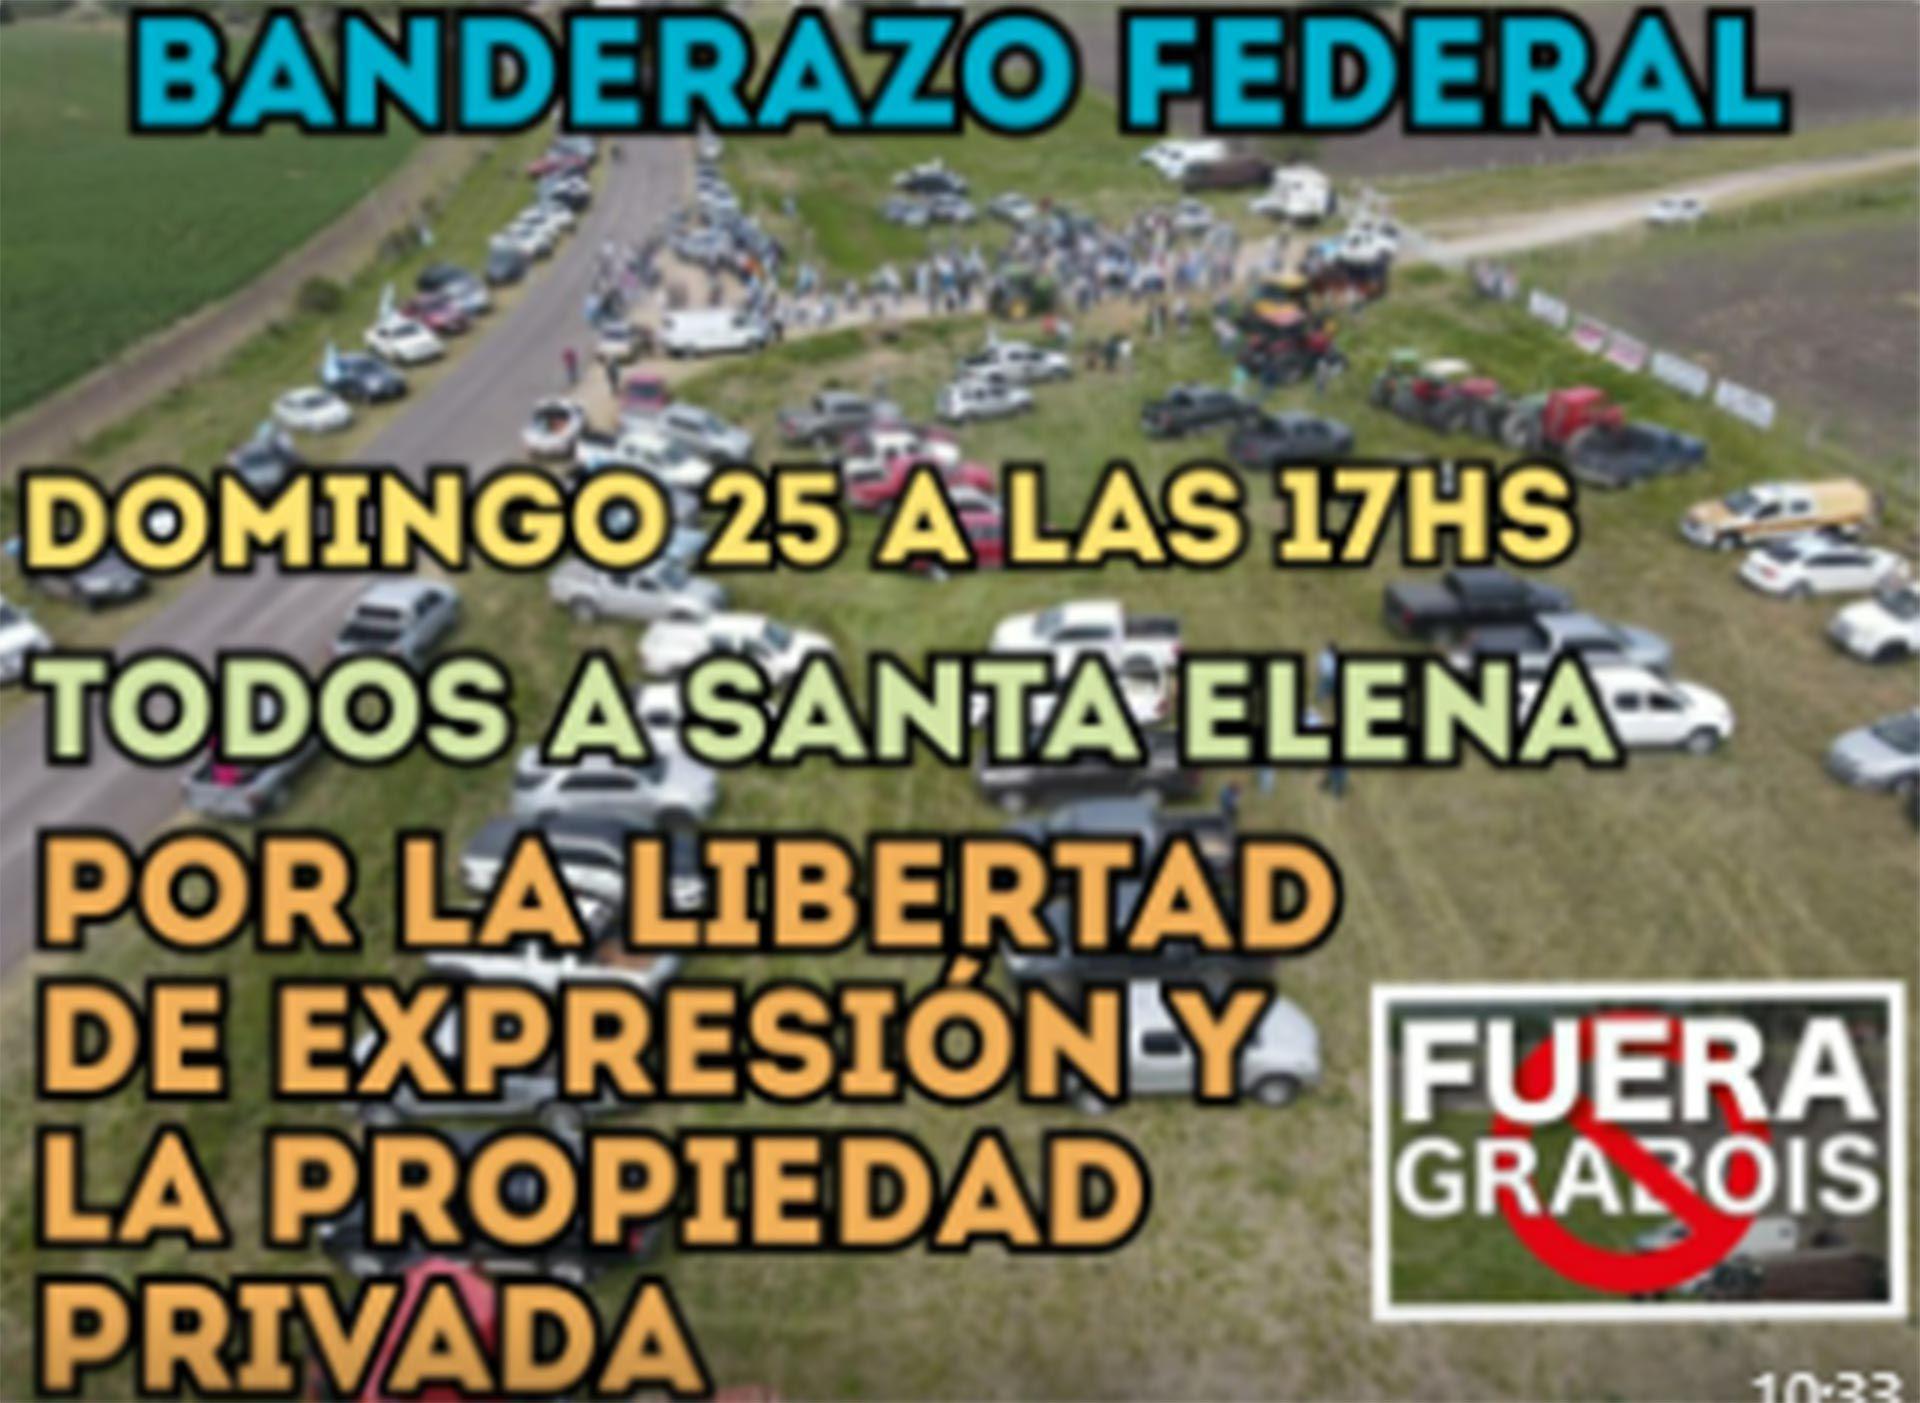 Entre Ríos Etchevehere Grabois Campo Usurpación Litigio SF